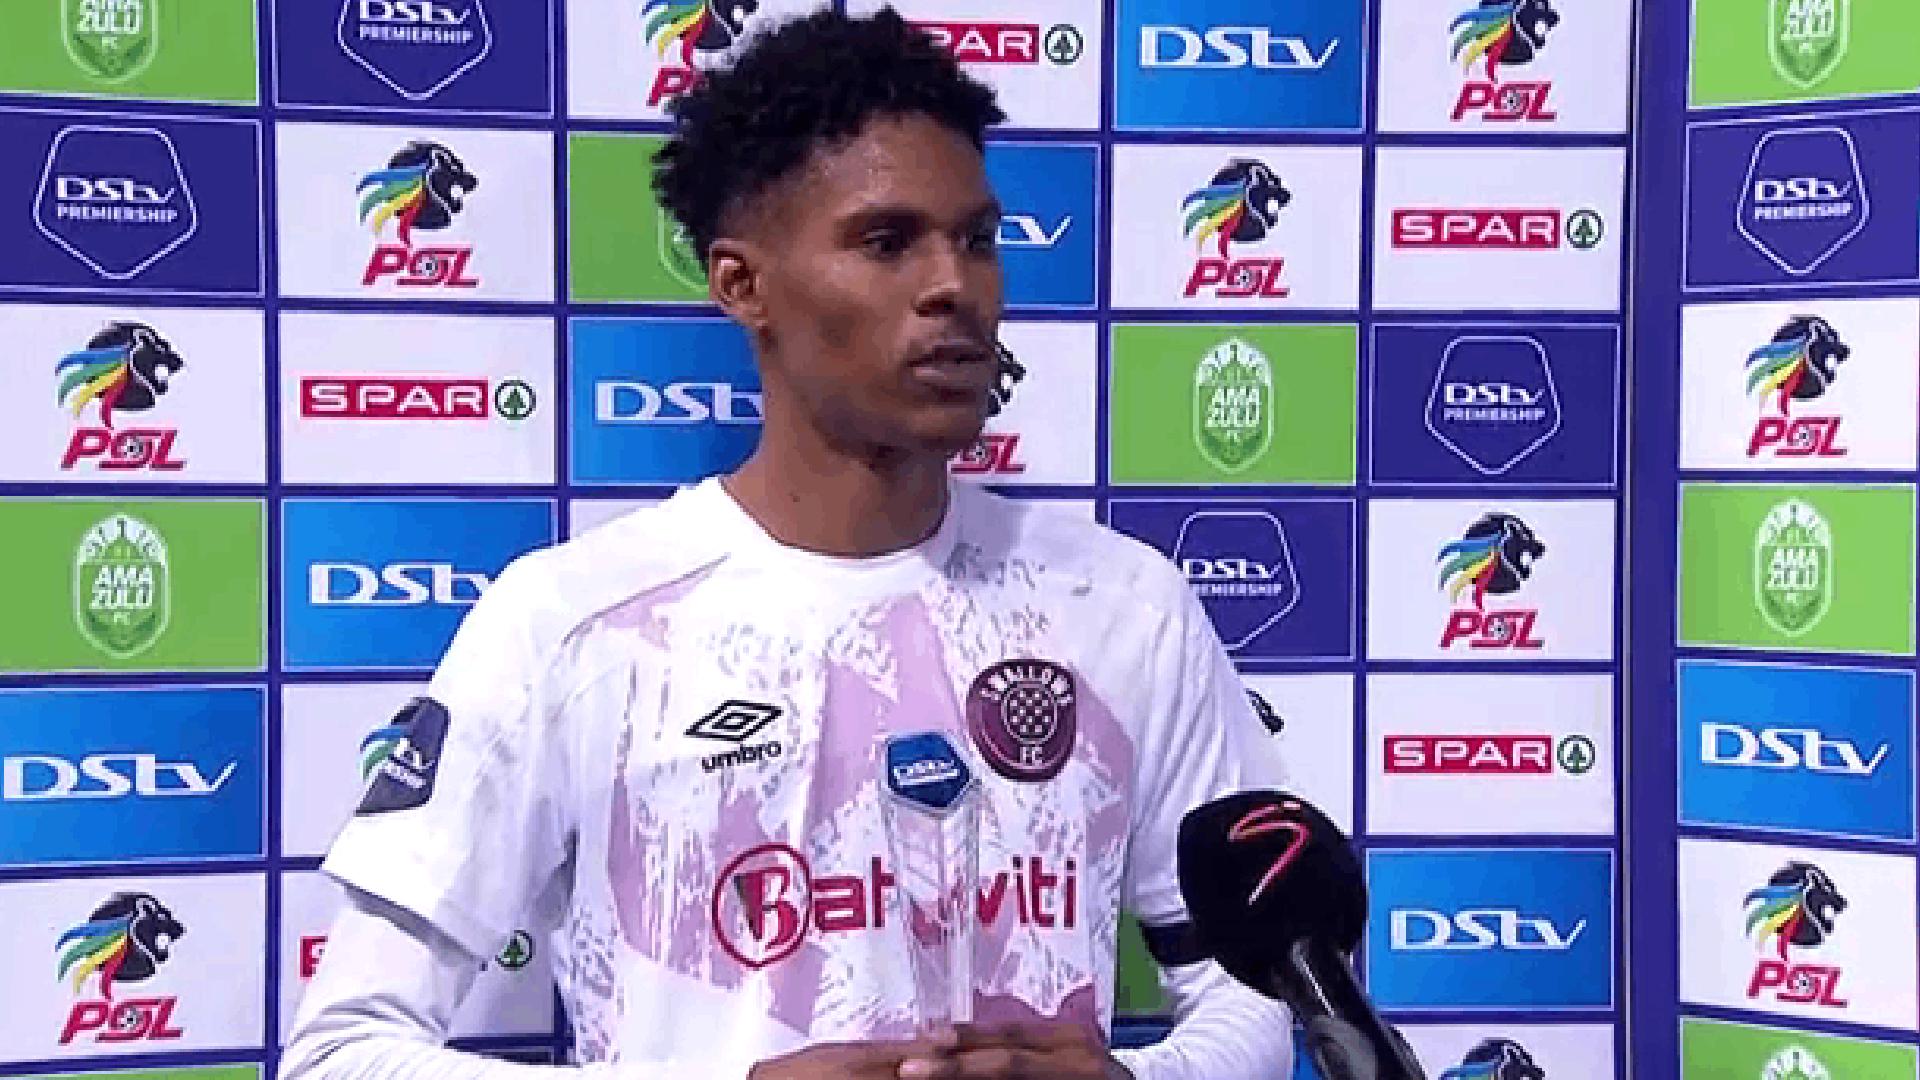 DStv Premiership   AmaZulu vs Swallows FC   Post-match interview with Junaid Sait